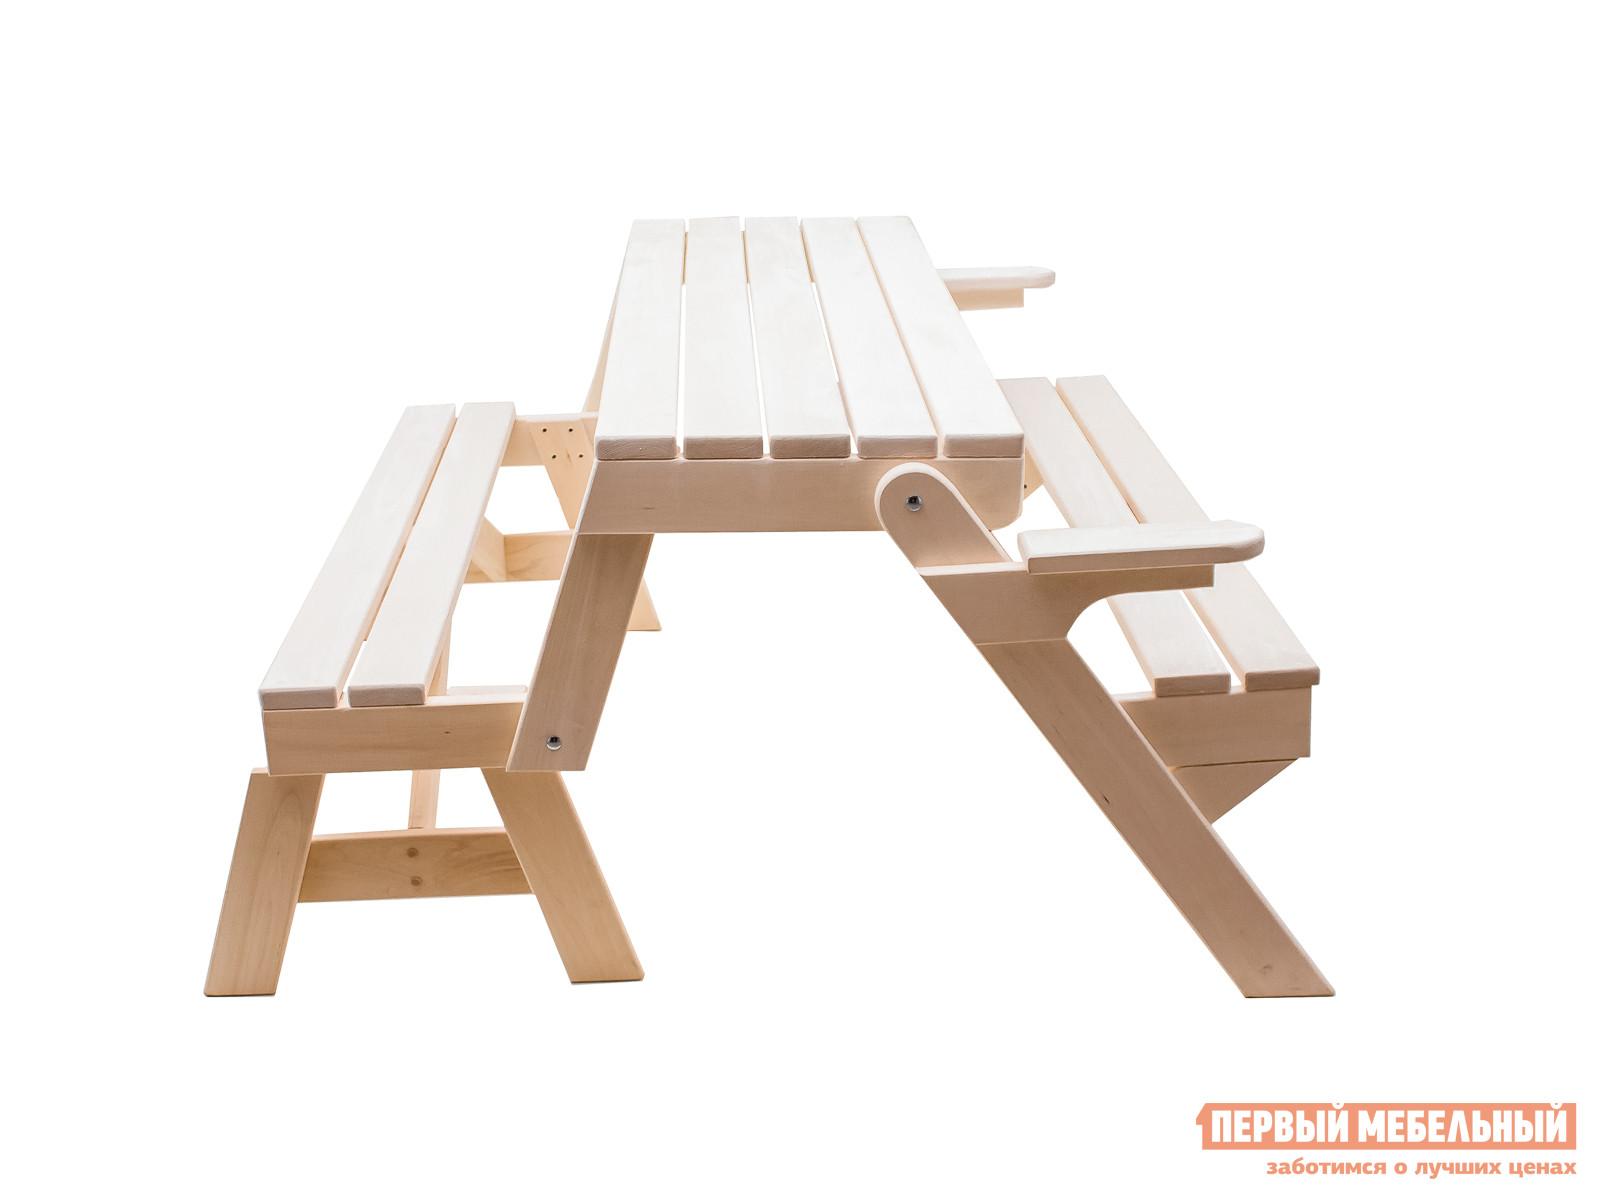 Набор мебели для пикника ММ Лоренс Липа от Купистол